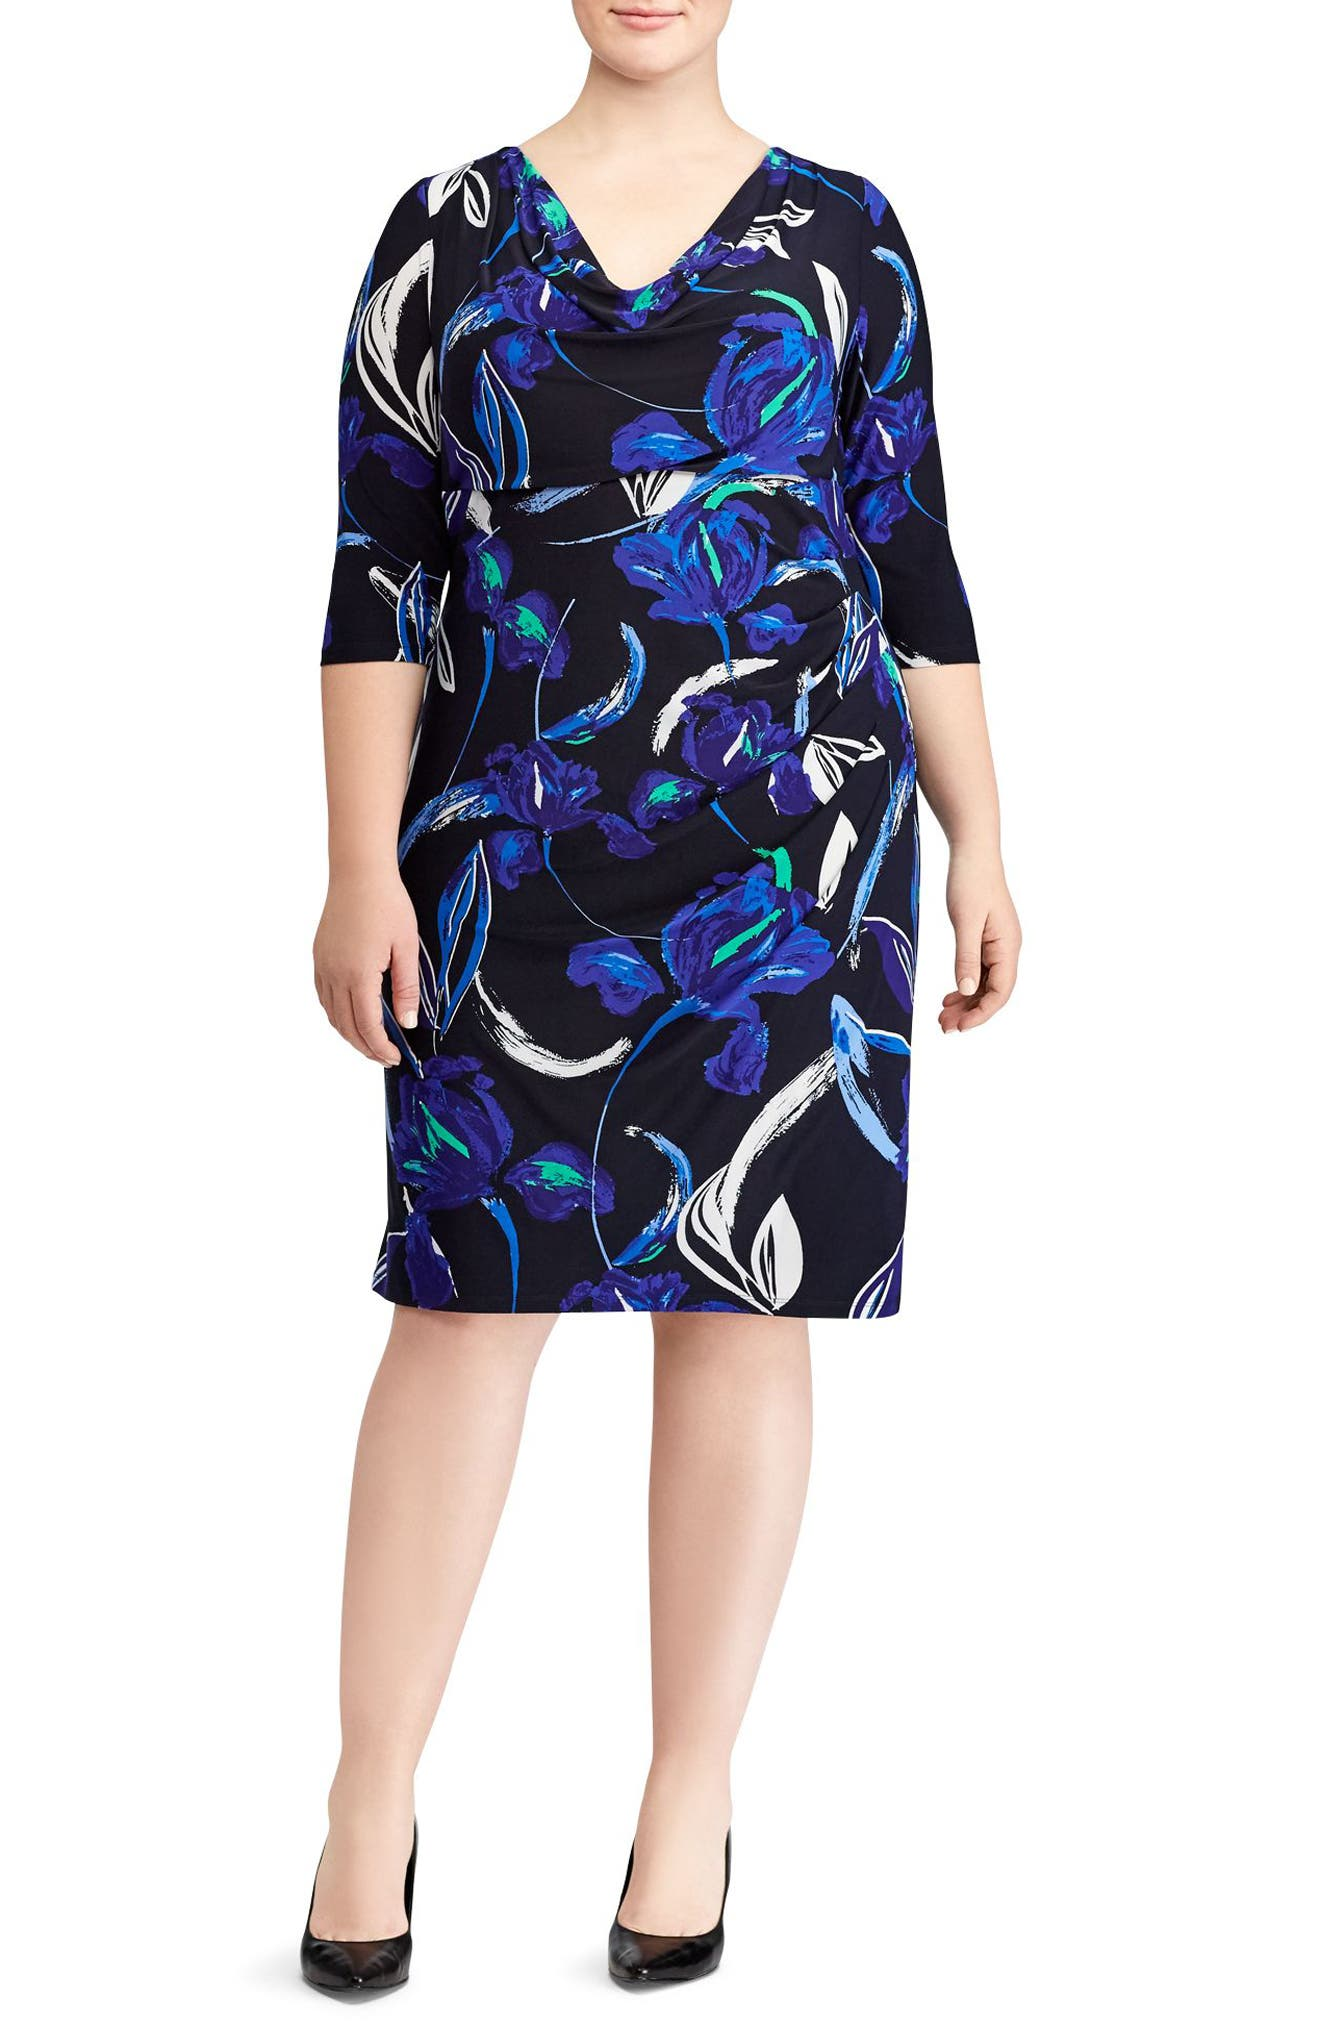 Alternate Image 1 Selected - Lauren Ralph Lauren Carleton Zagora Floral Sheath Dress (Plus Size)